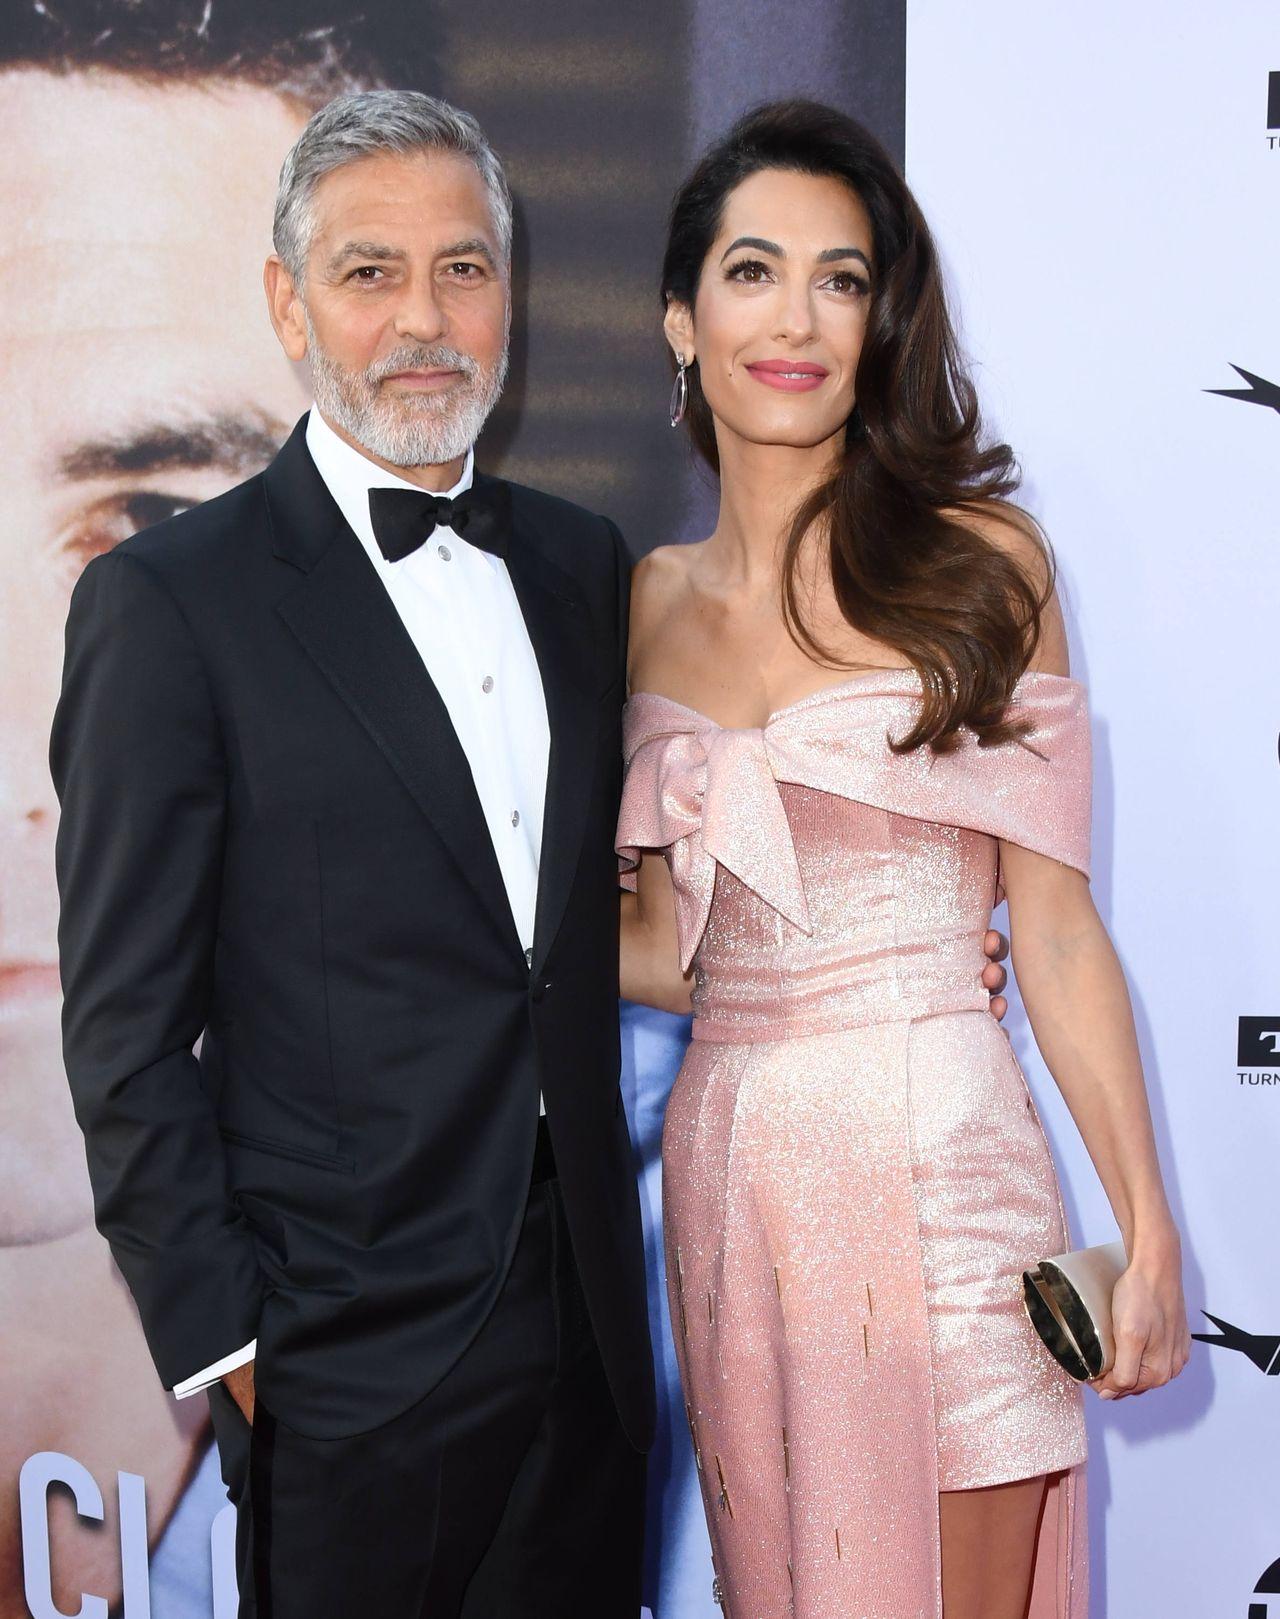 AFI' s 46th Life Achievement Award Gala Tribute to George Clooney  George Clooney, Amal Clooney